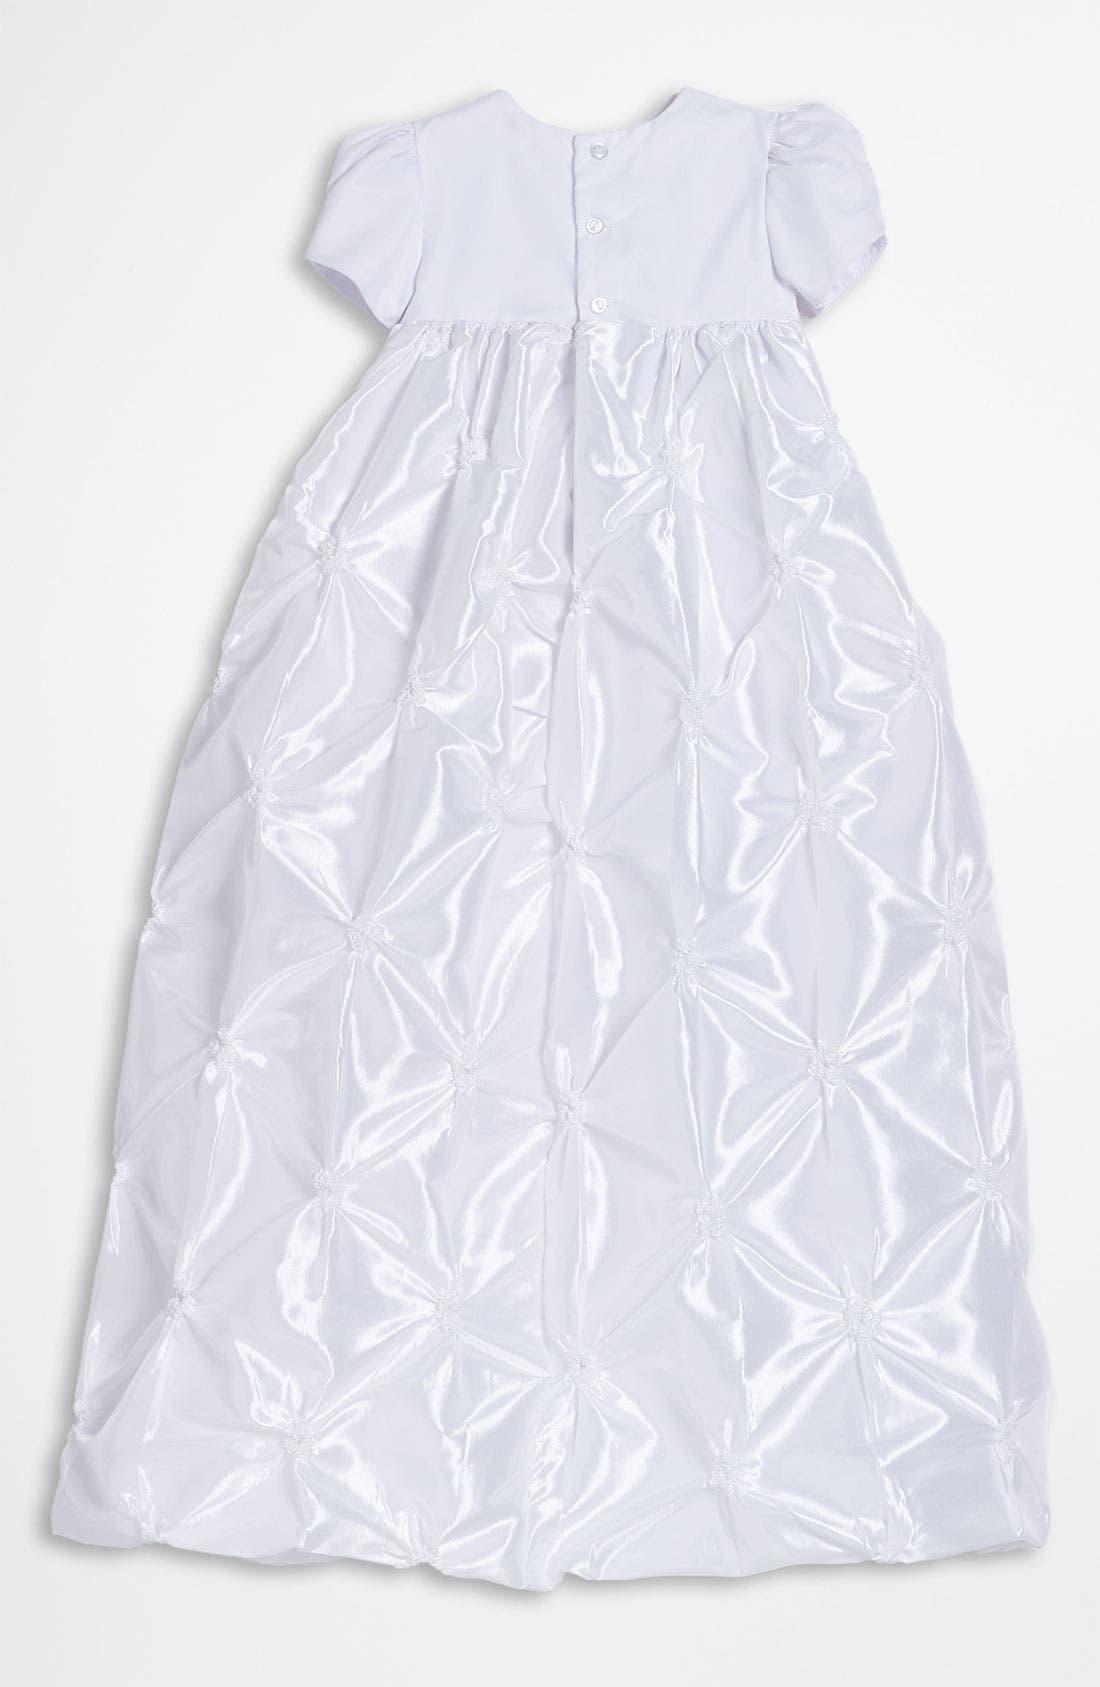 Alternate Image 2  - Little Things Mean a Lot Taffeta Gown & Bonnet (Baby)